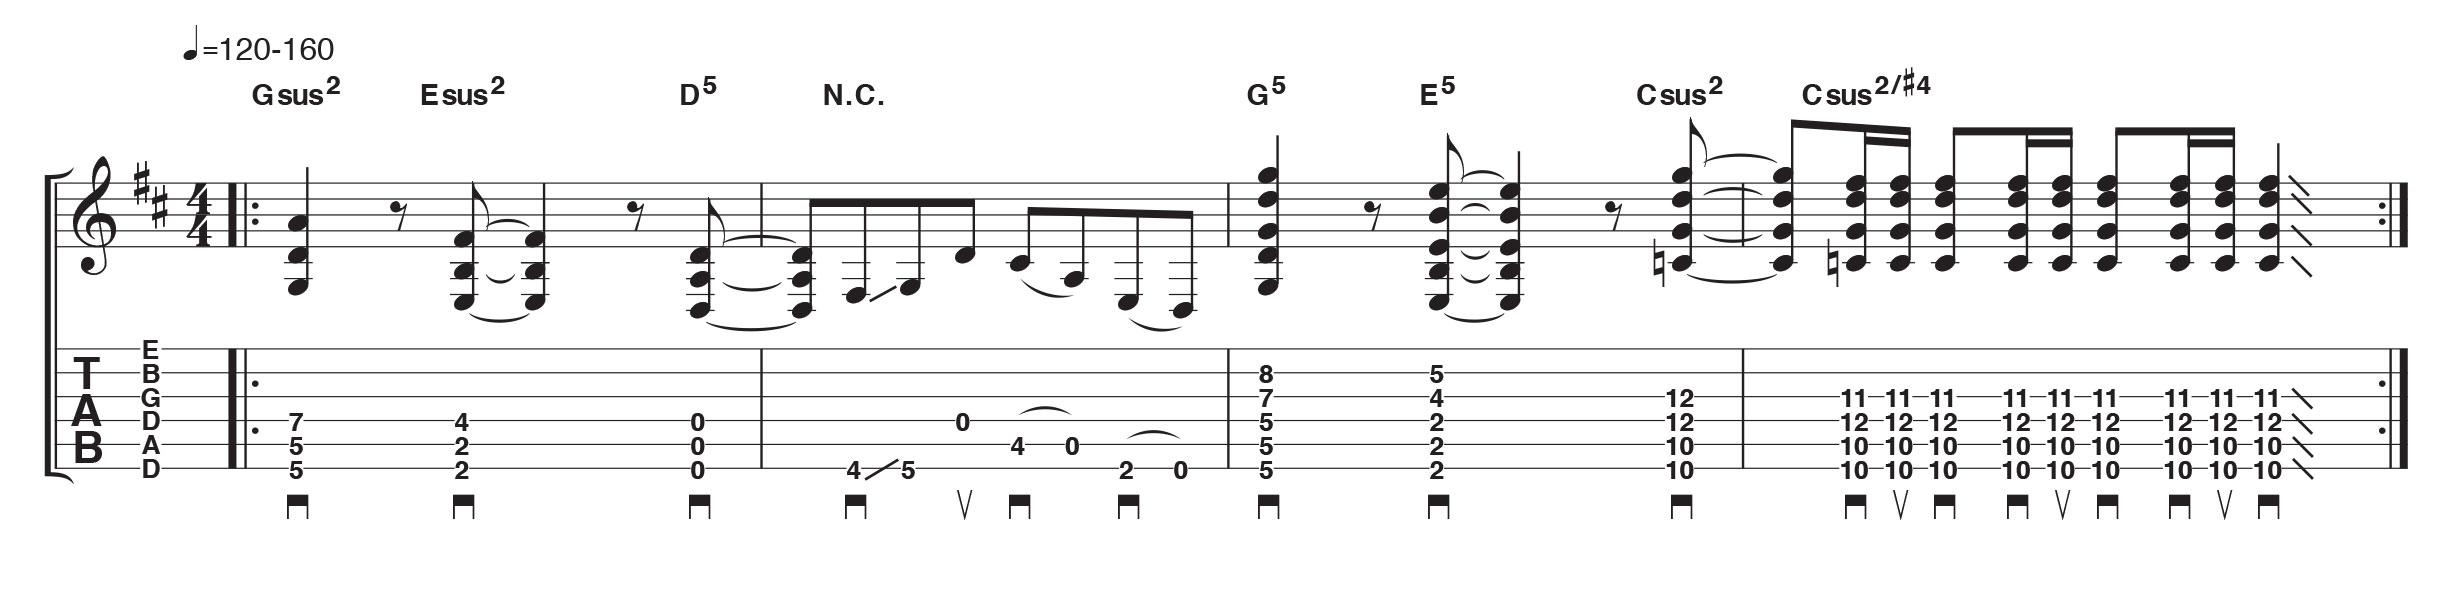 4 alternate guitar tunings you need to know | MusicRadar